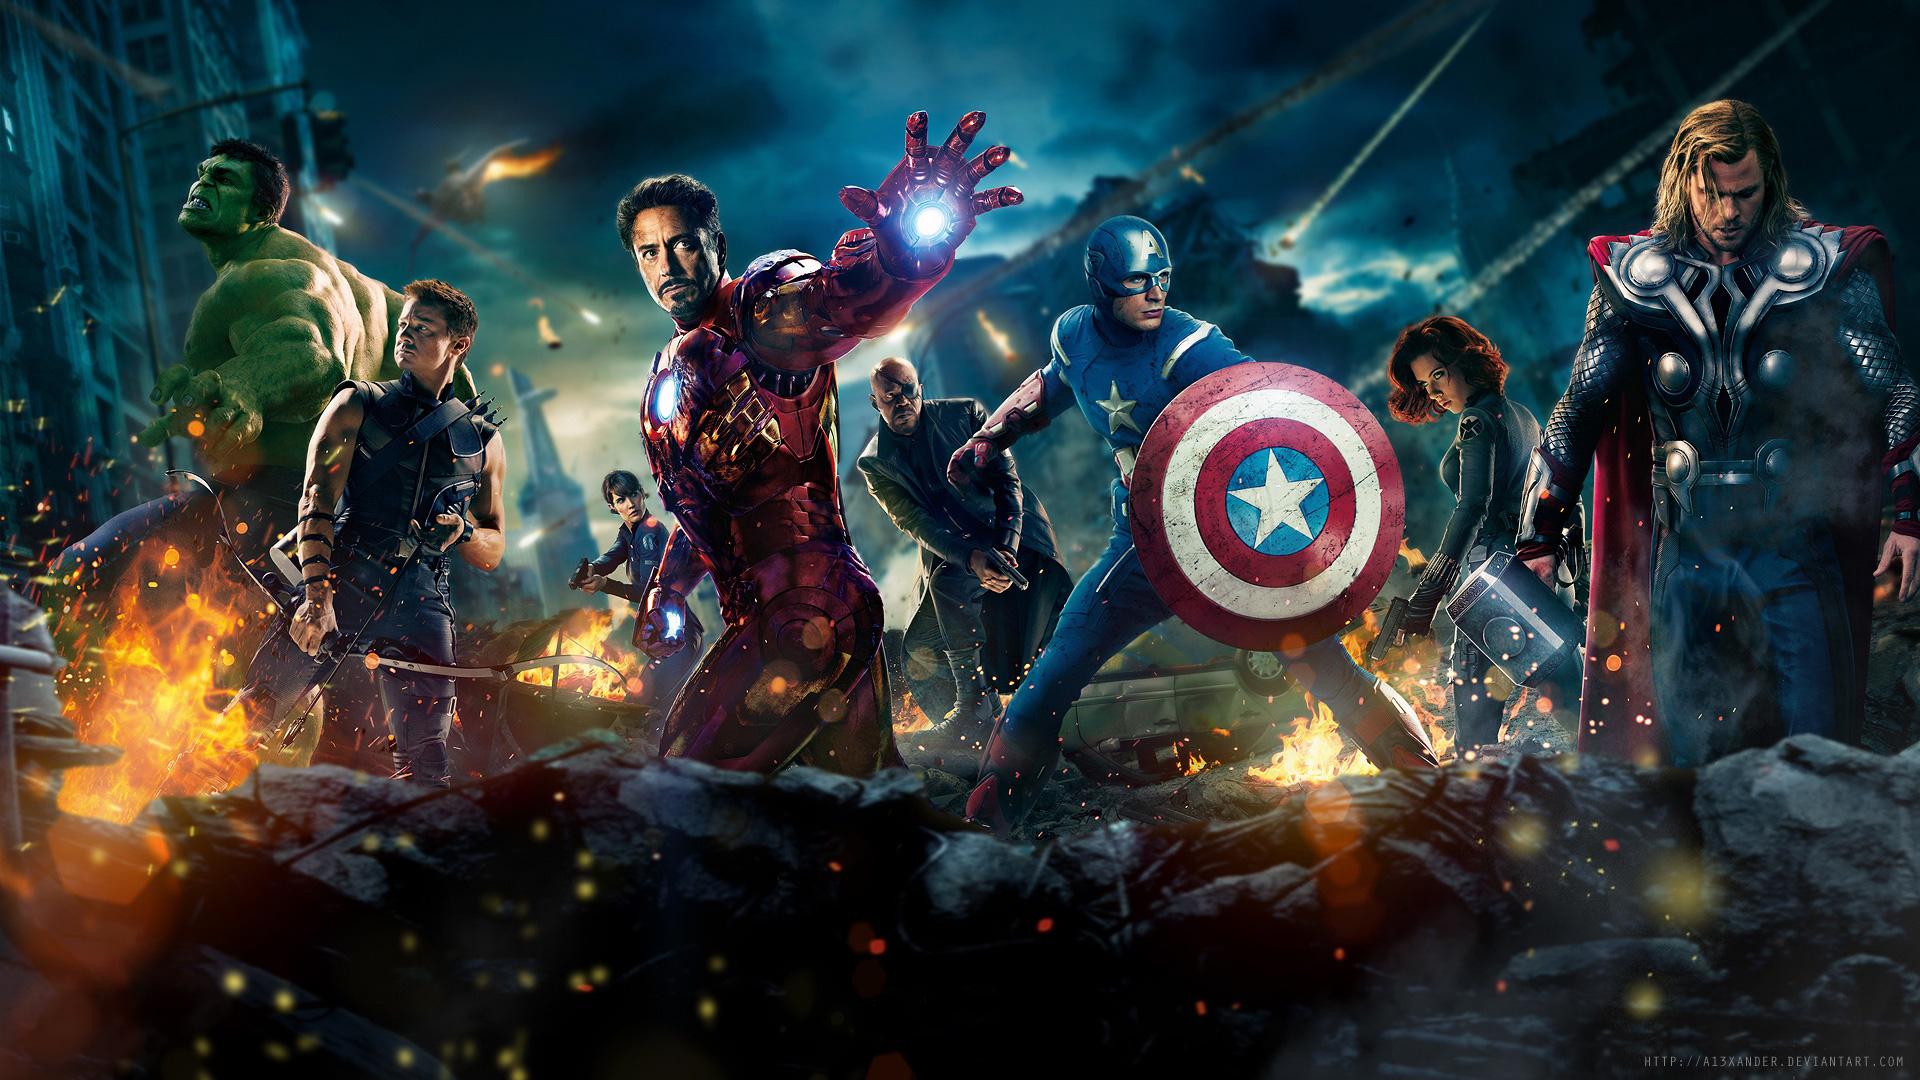 Avengers Full HD Wallpapers download 1080p desktop backgrounds 1920x1080